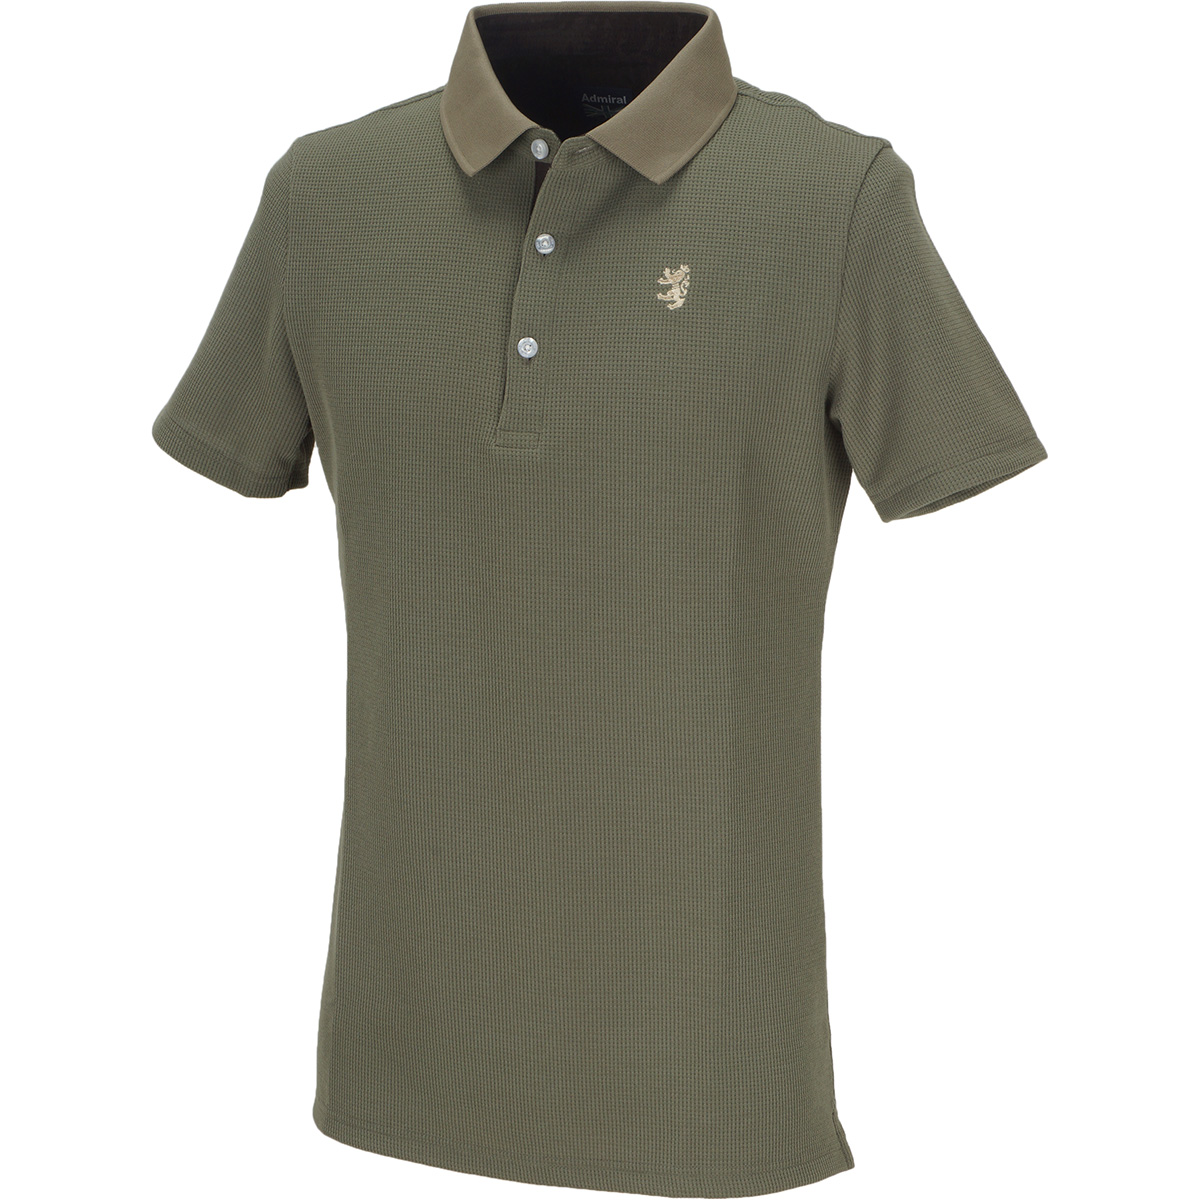 GDO限定 ワッフル半袖ポロシャツ